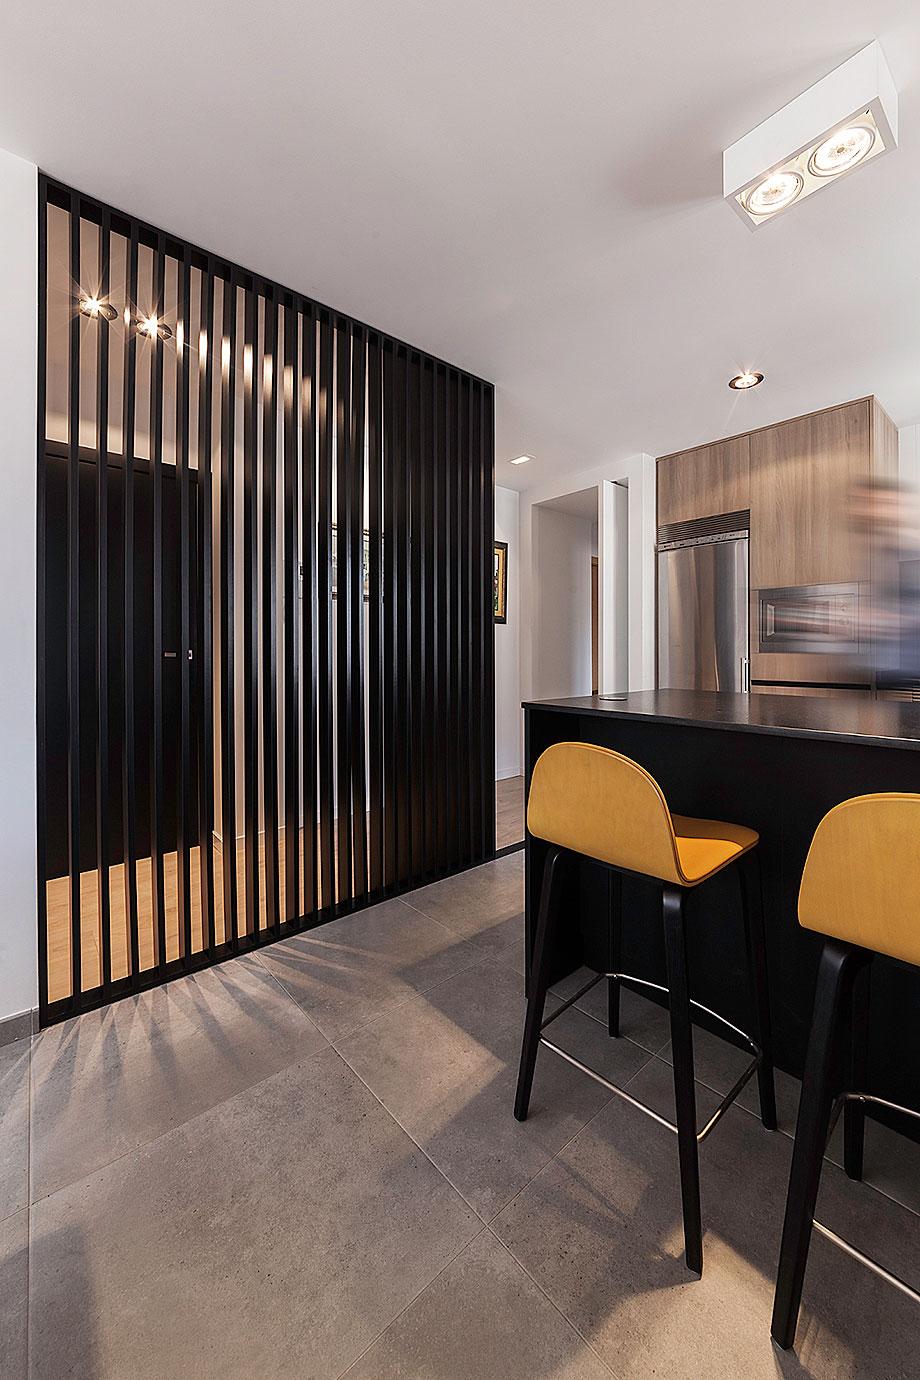 vivienda-nan-arquitectos-4